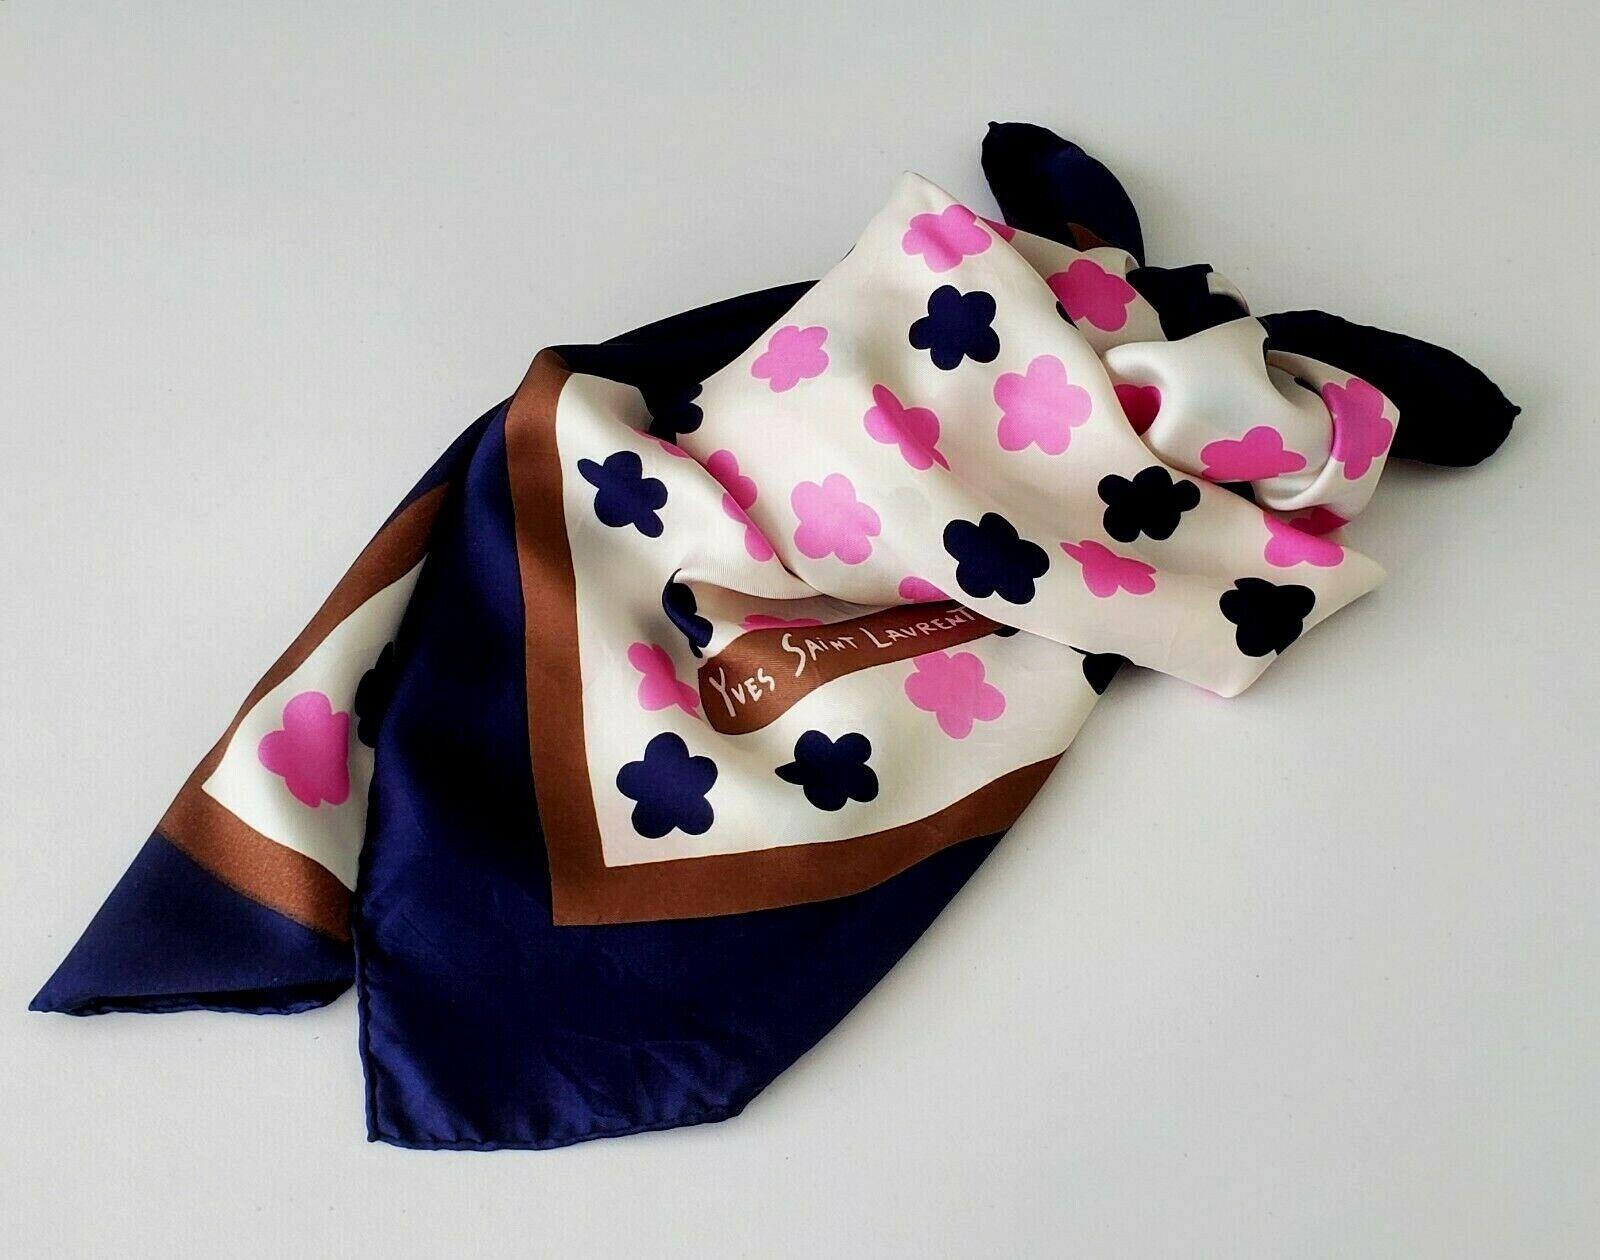 Vintage 1970's YVES SAINT LAURENT Navy Blue and Pink Flower Print Silk Scarf